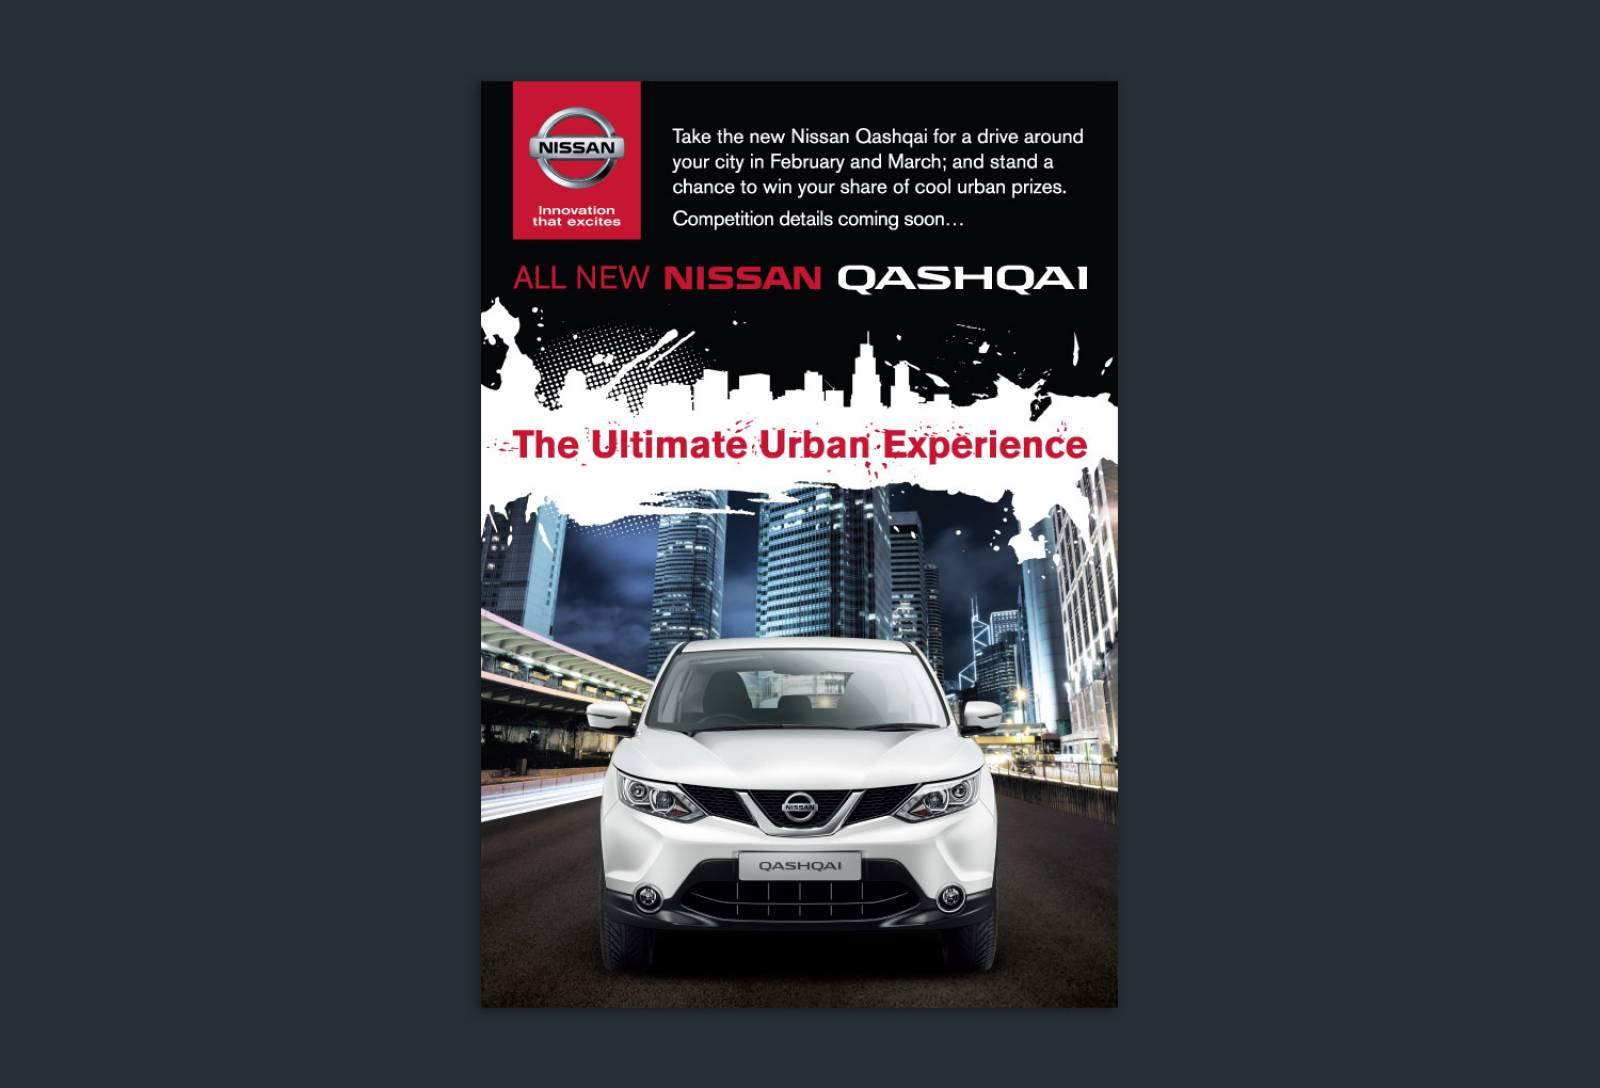 Nissan-Poster-Graphic-Design-Agency-Canterbury-Qashqai.jpg